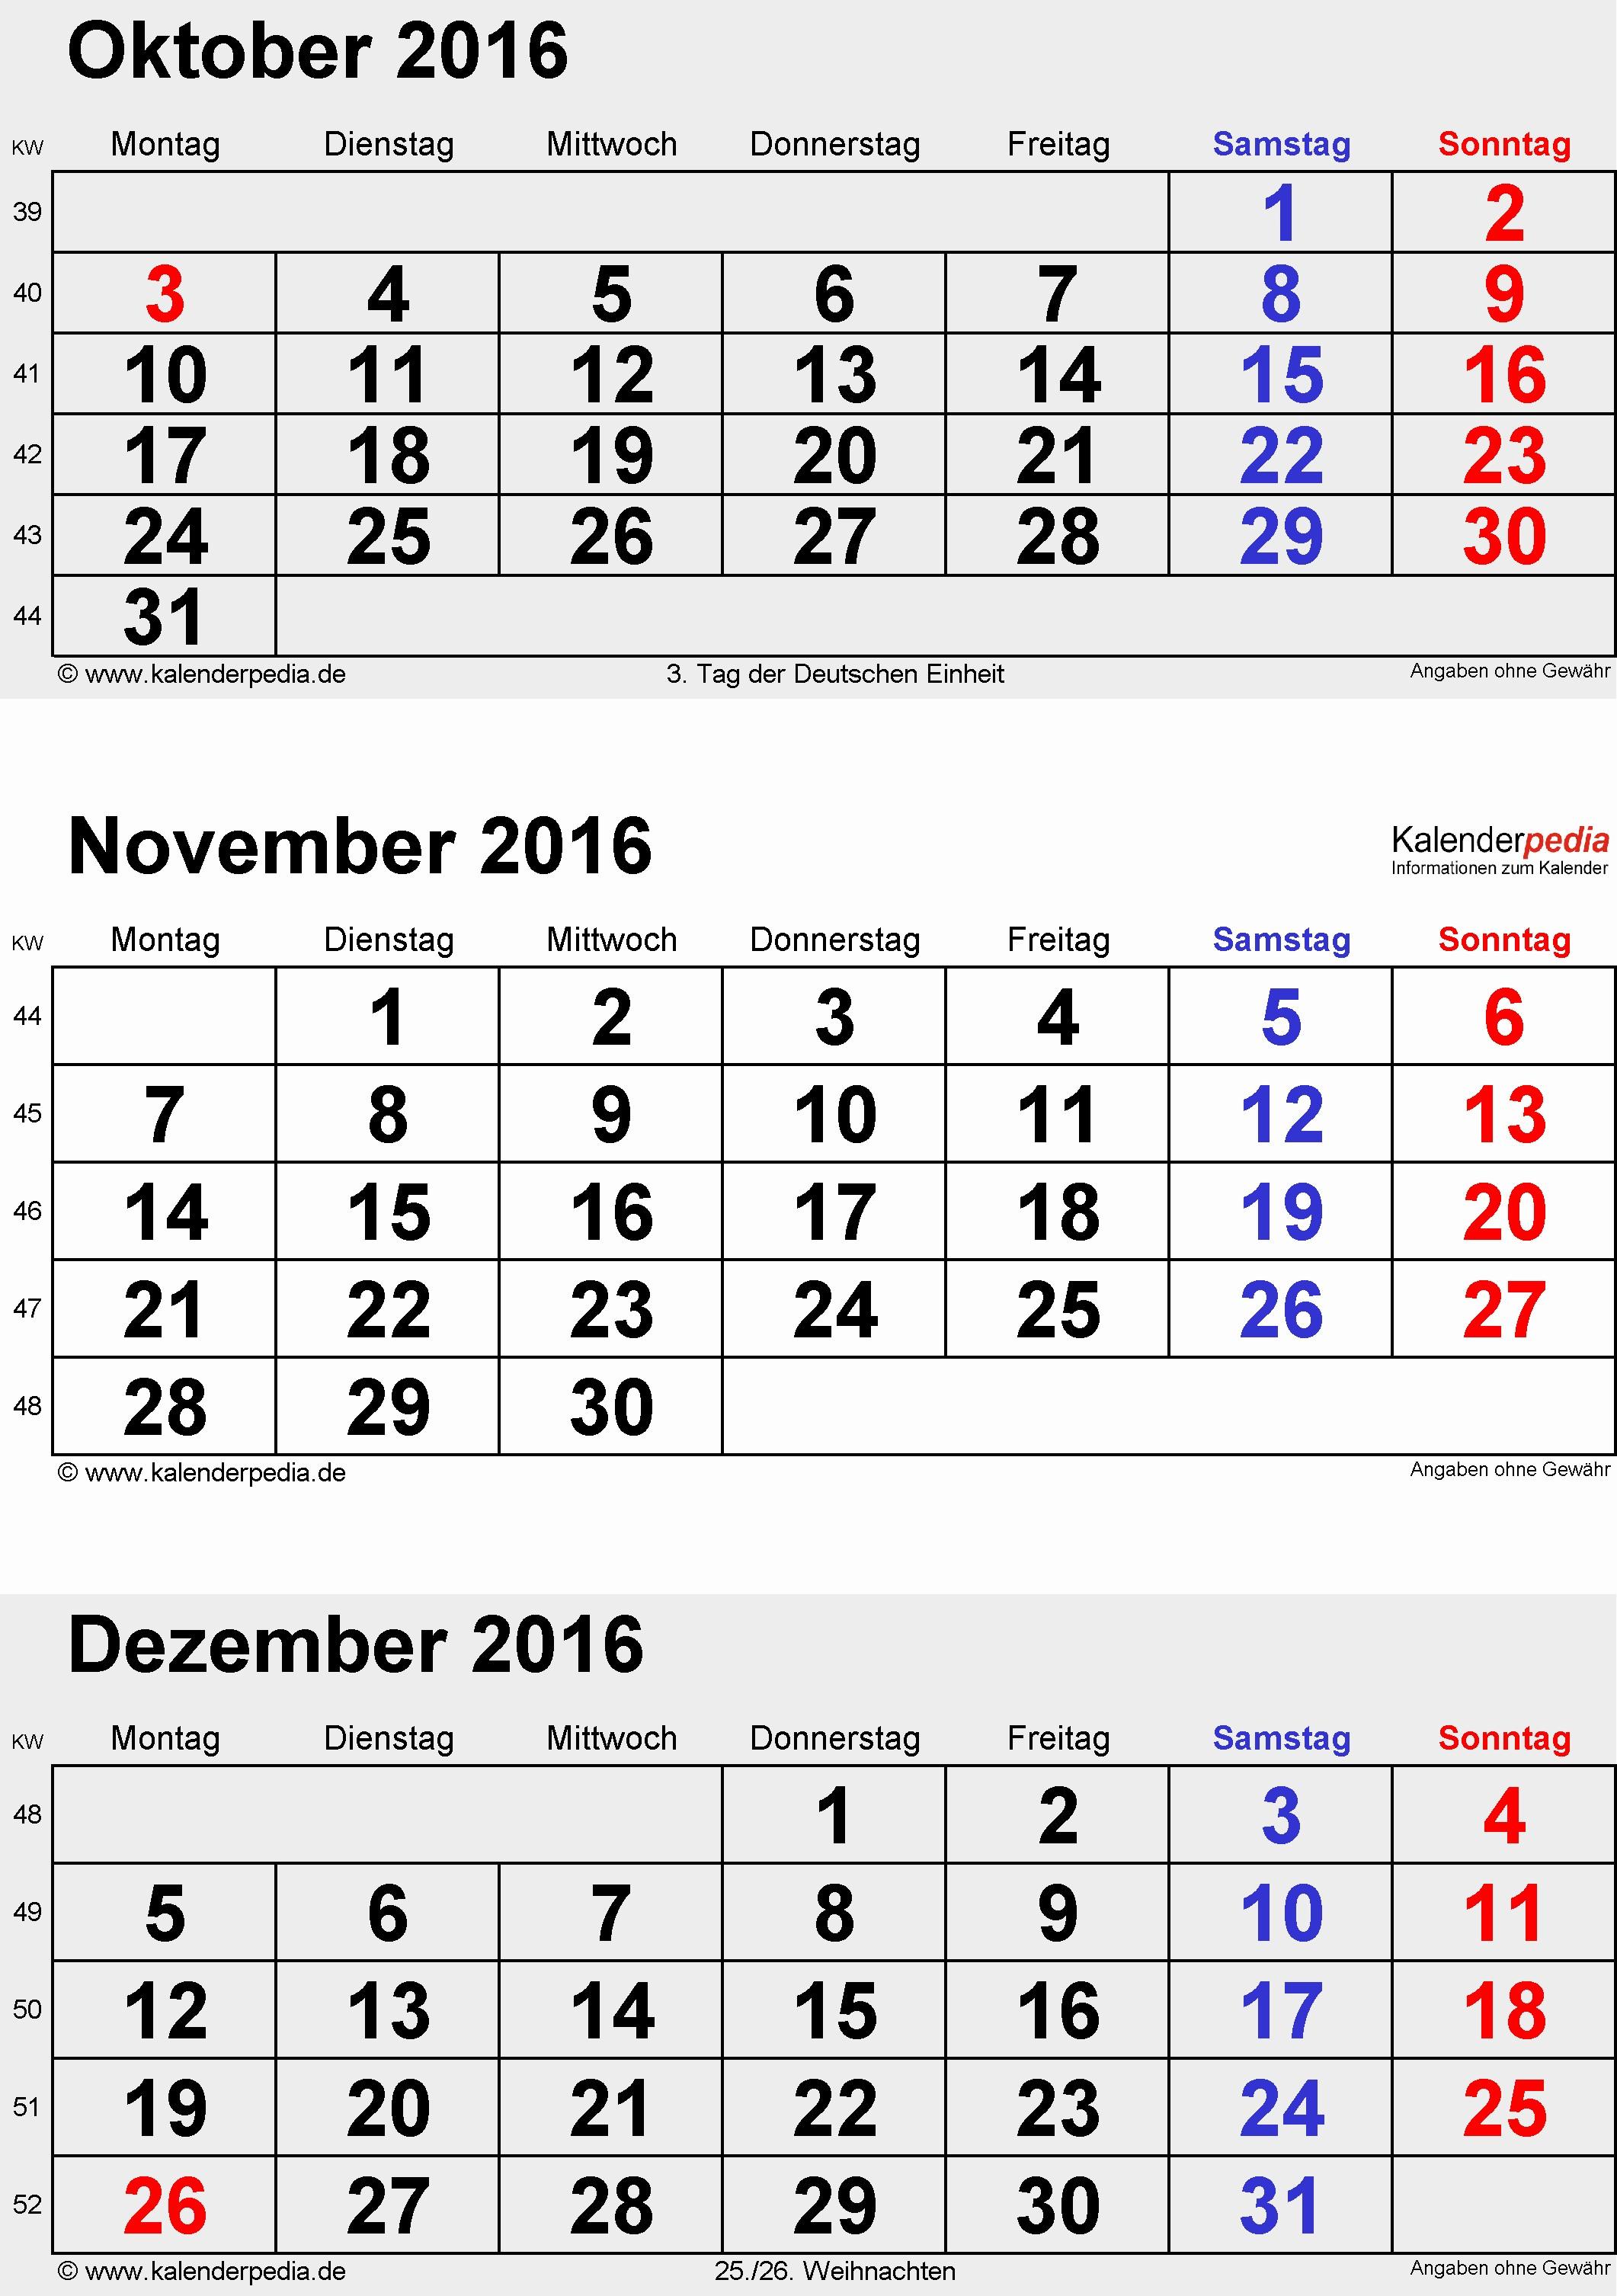 Kalender 2019 Schulferien Niedersachsen Pdf Mejores Y Más Novedosos 14 Elegant Fotografie Von Kalender 2016 Mit Feiertagen Sachsen Of Kalender 2019 Schulferien Niedersachsen Pdf Mejores Y Más Novedosos Wohnzimmer 2019